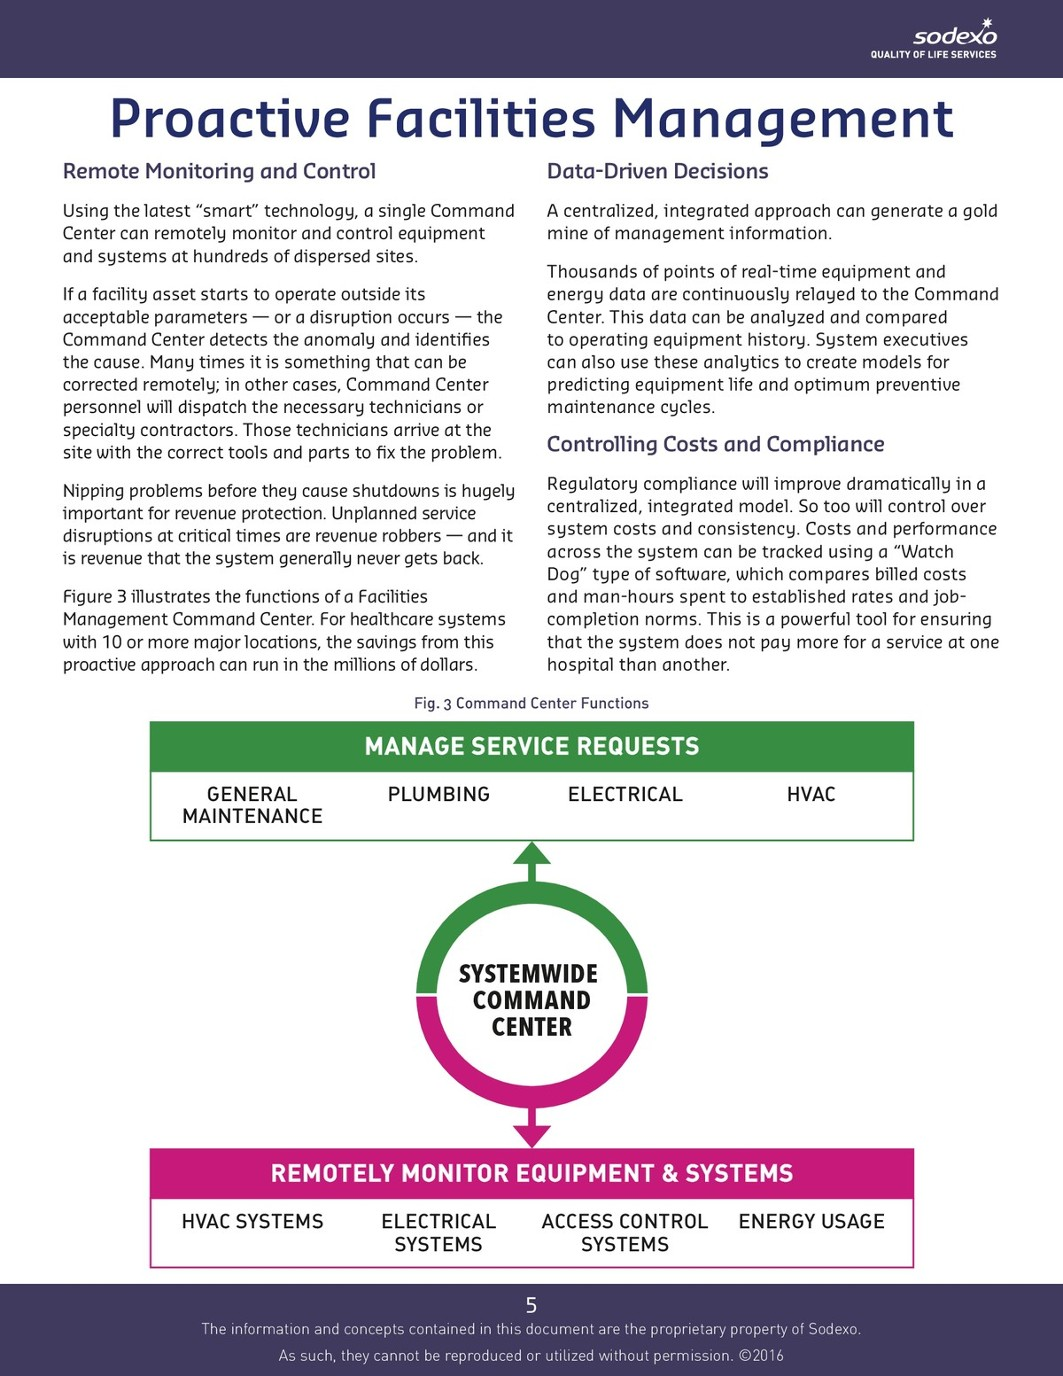 Healthcare Facilities Management Whitepaper